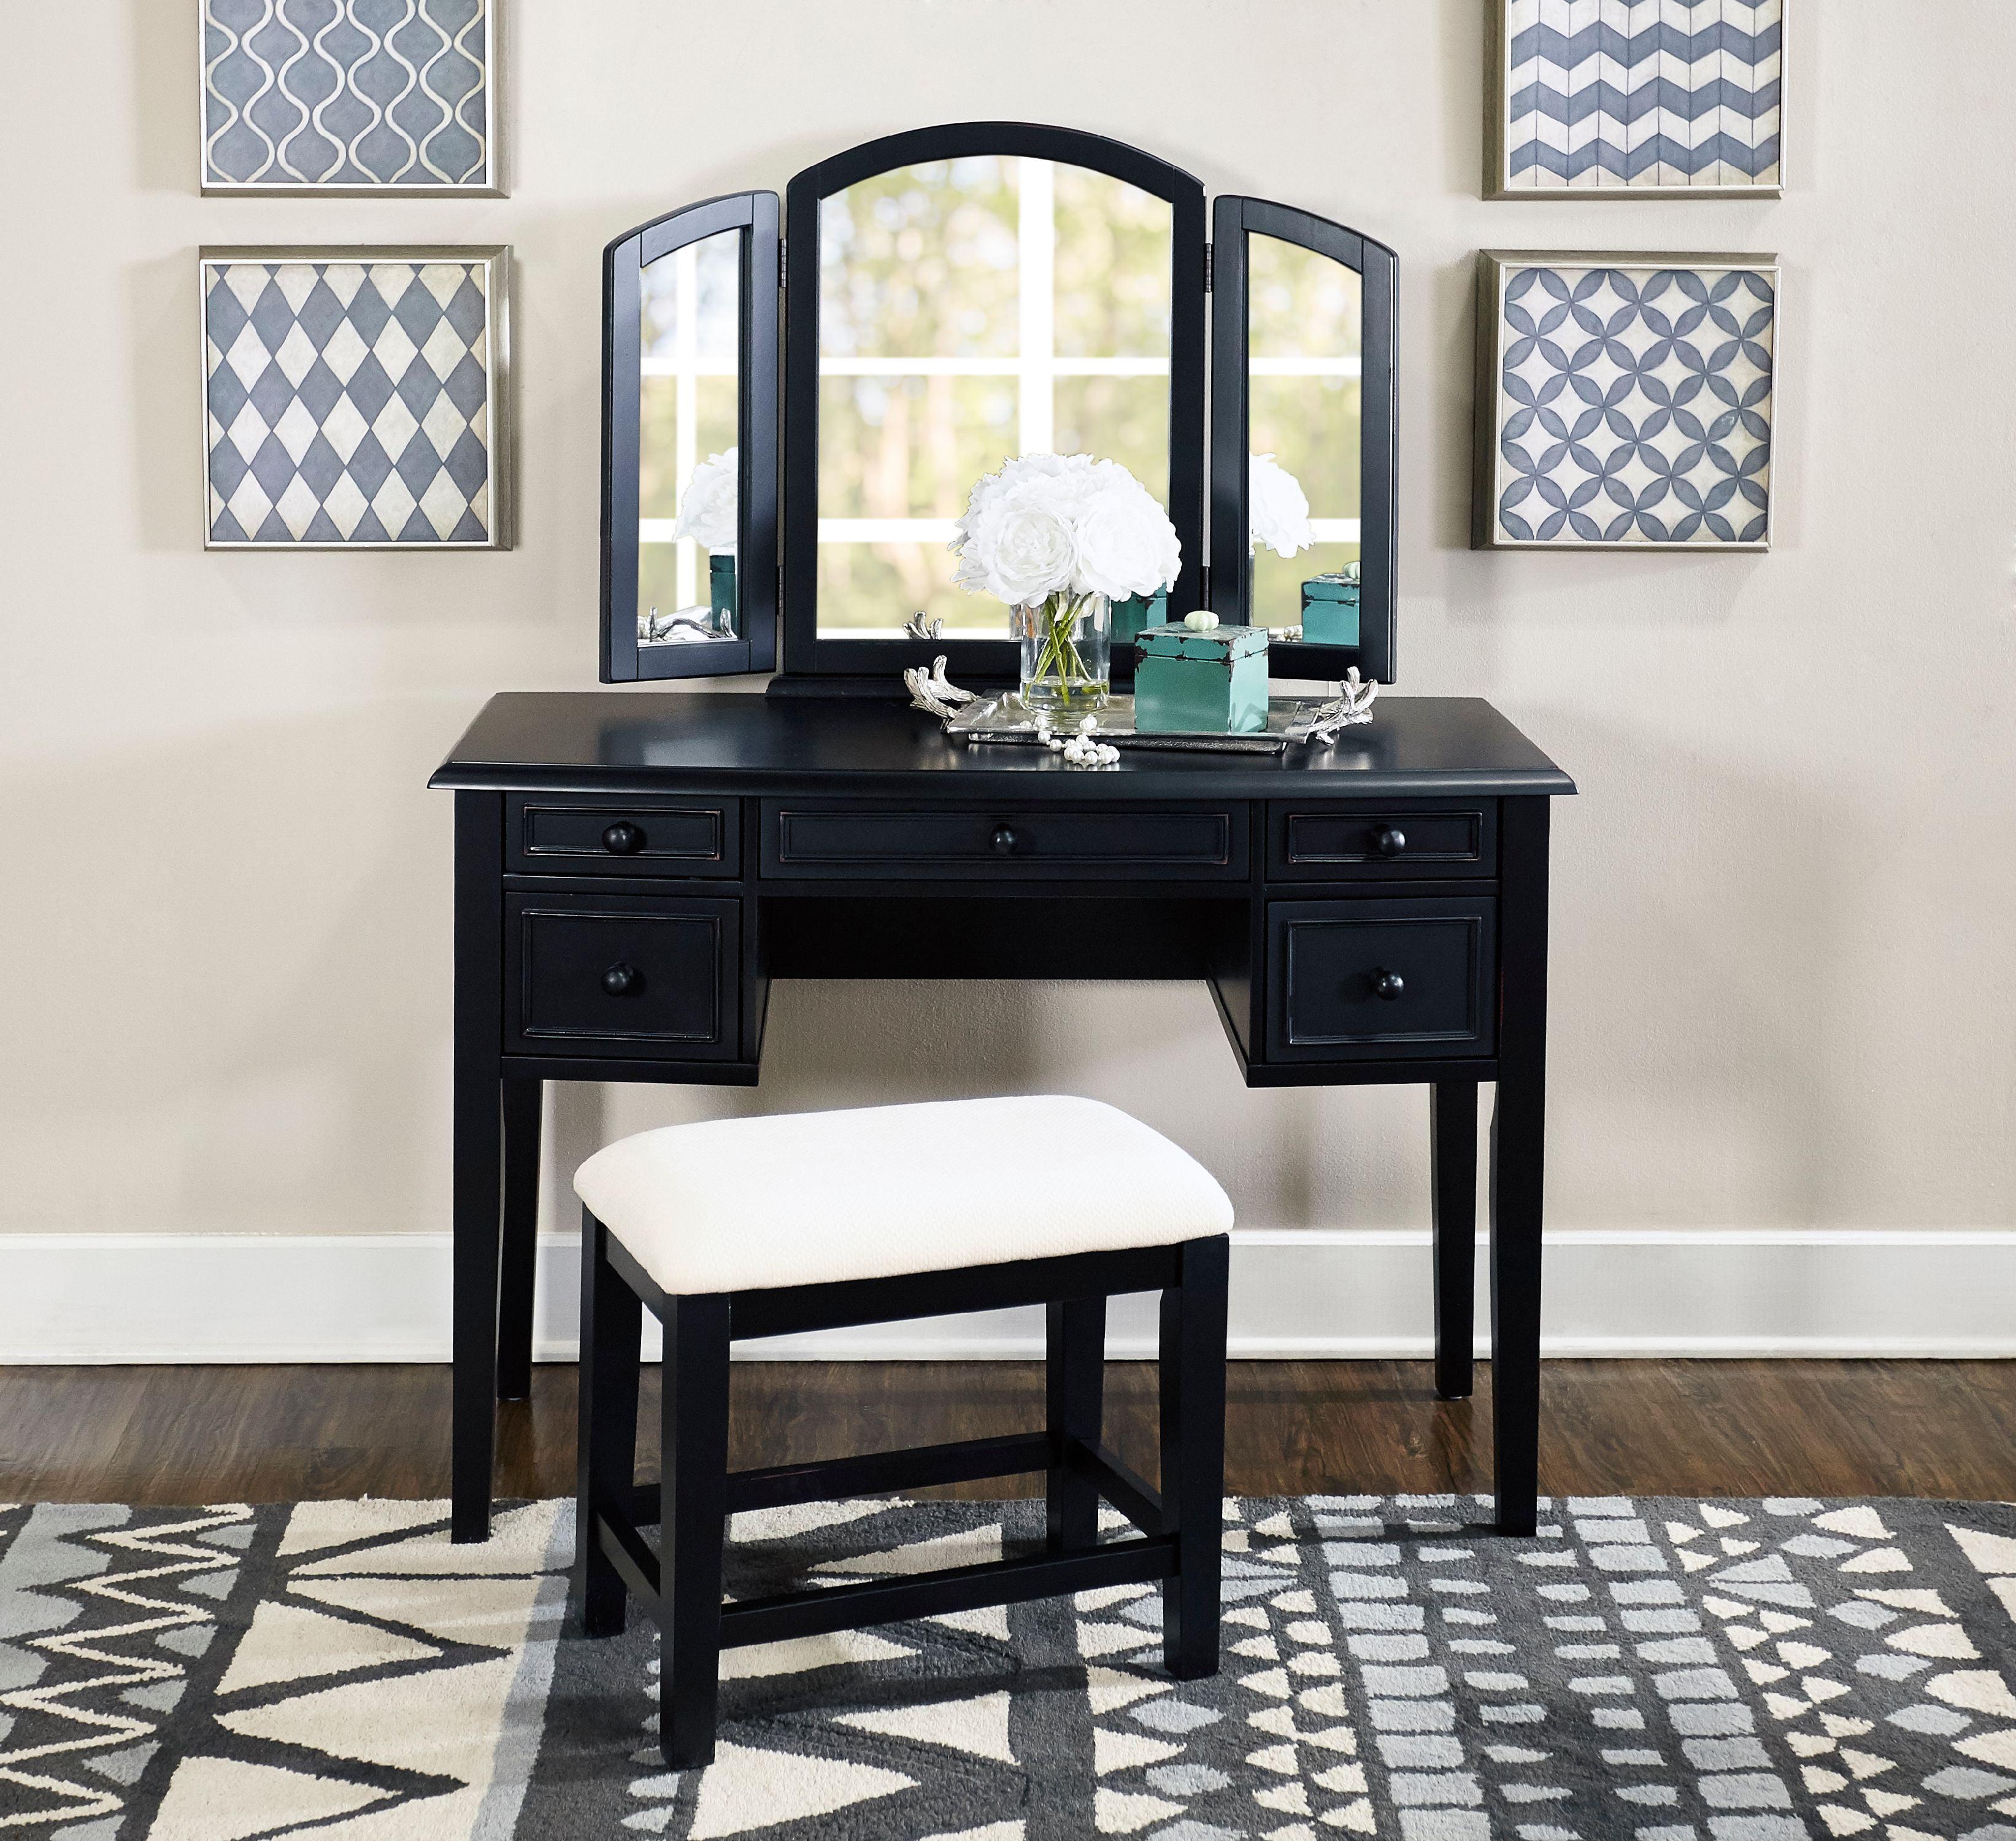 3 Piece Vanity Mirror And Bench Set Multiple Colors Walmart Com